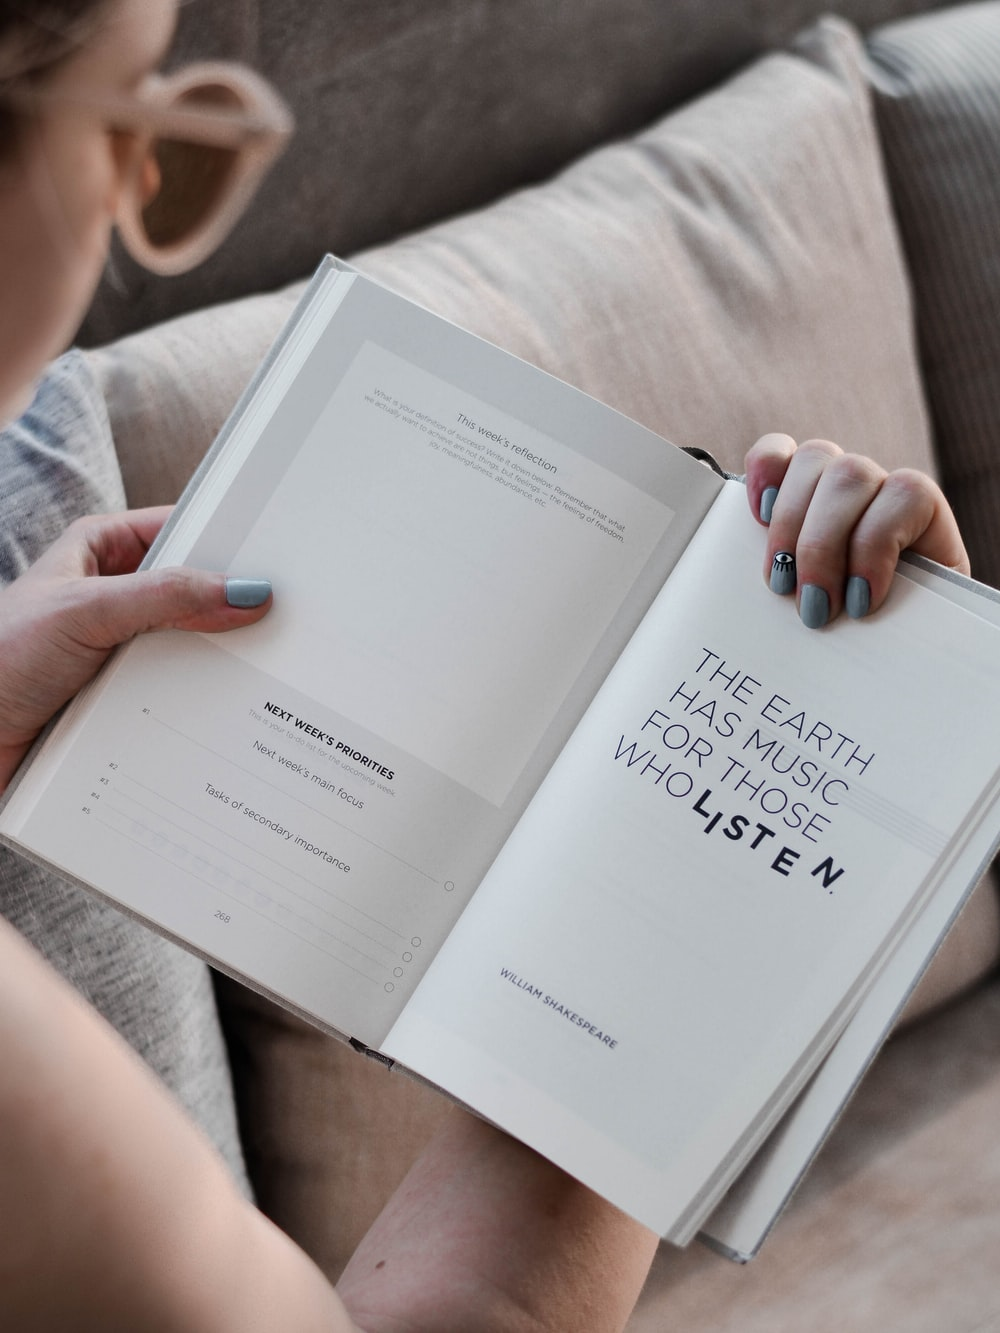 person reading an open book